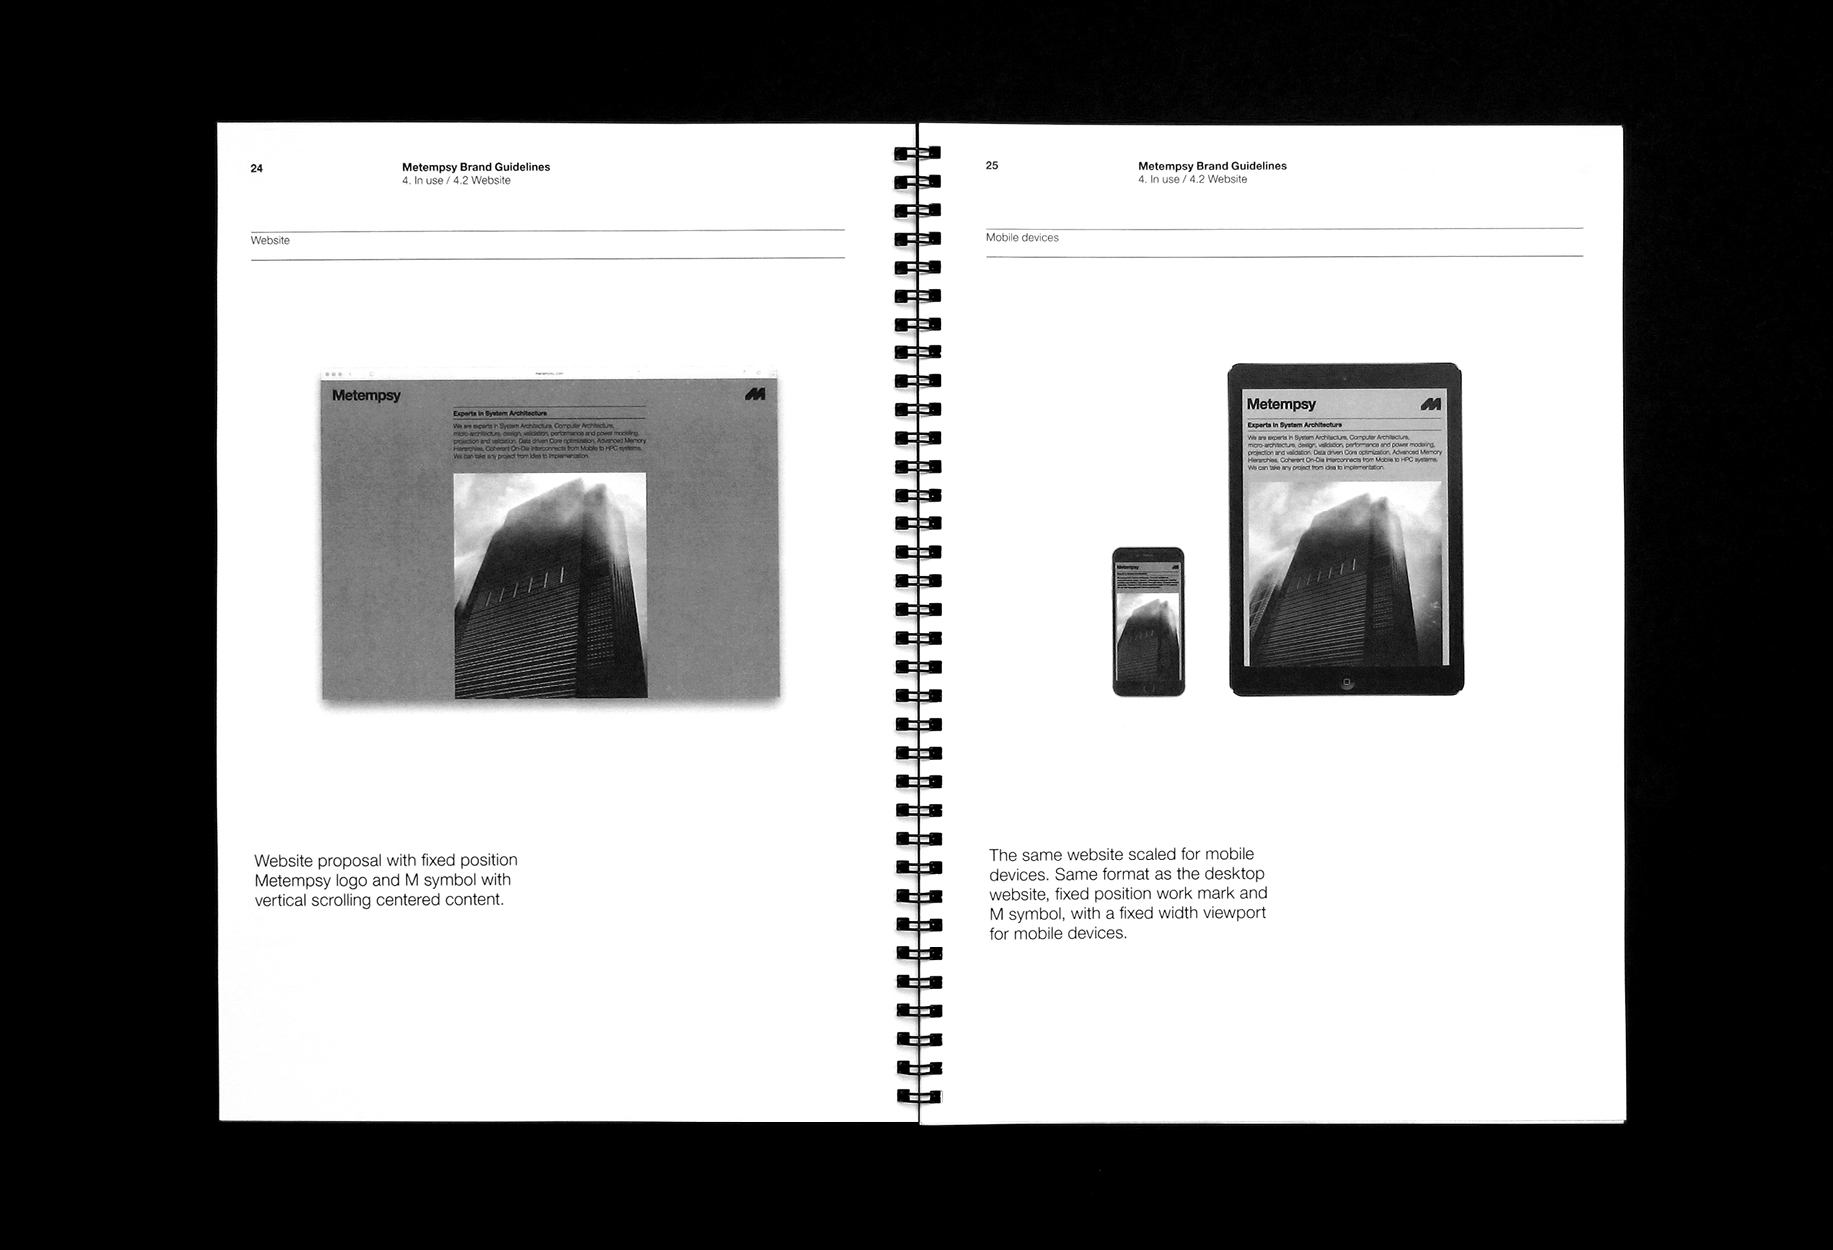 Metempsy-Graphic-Design-Standards-Manual-13.jpg